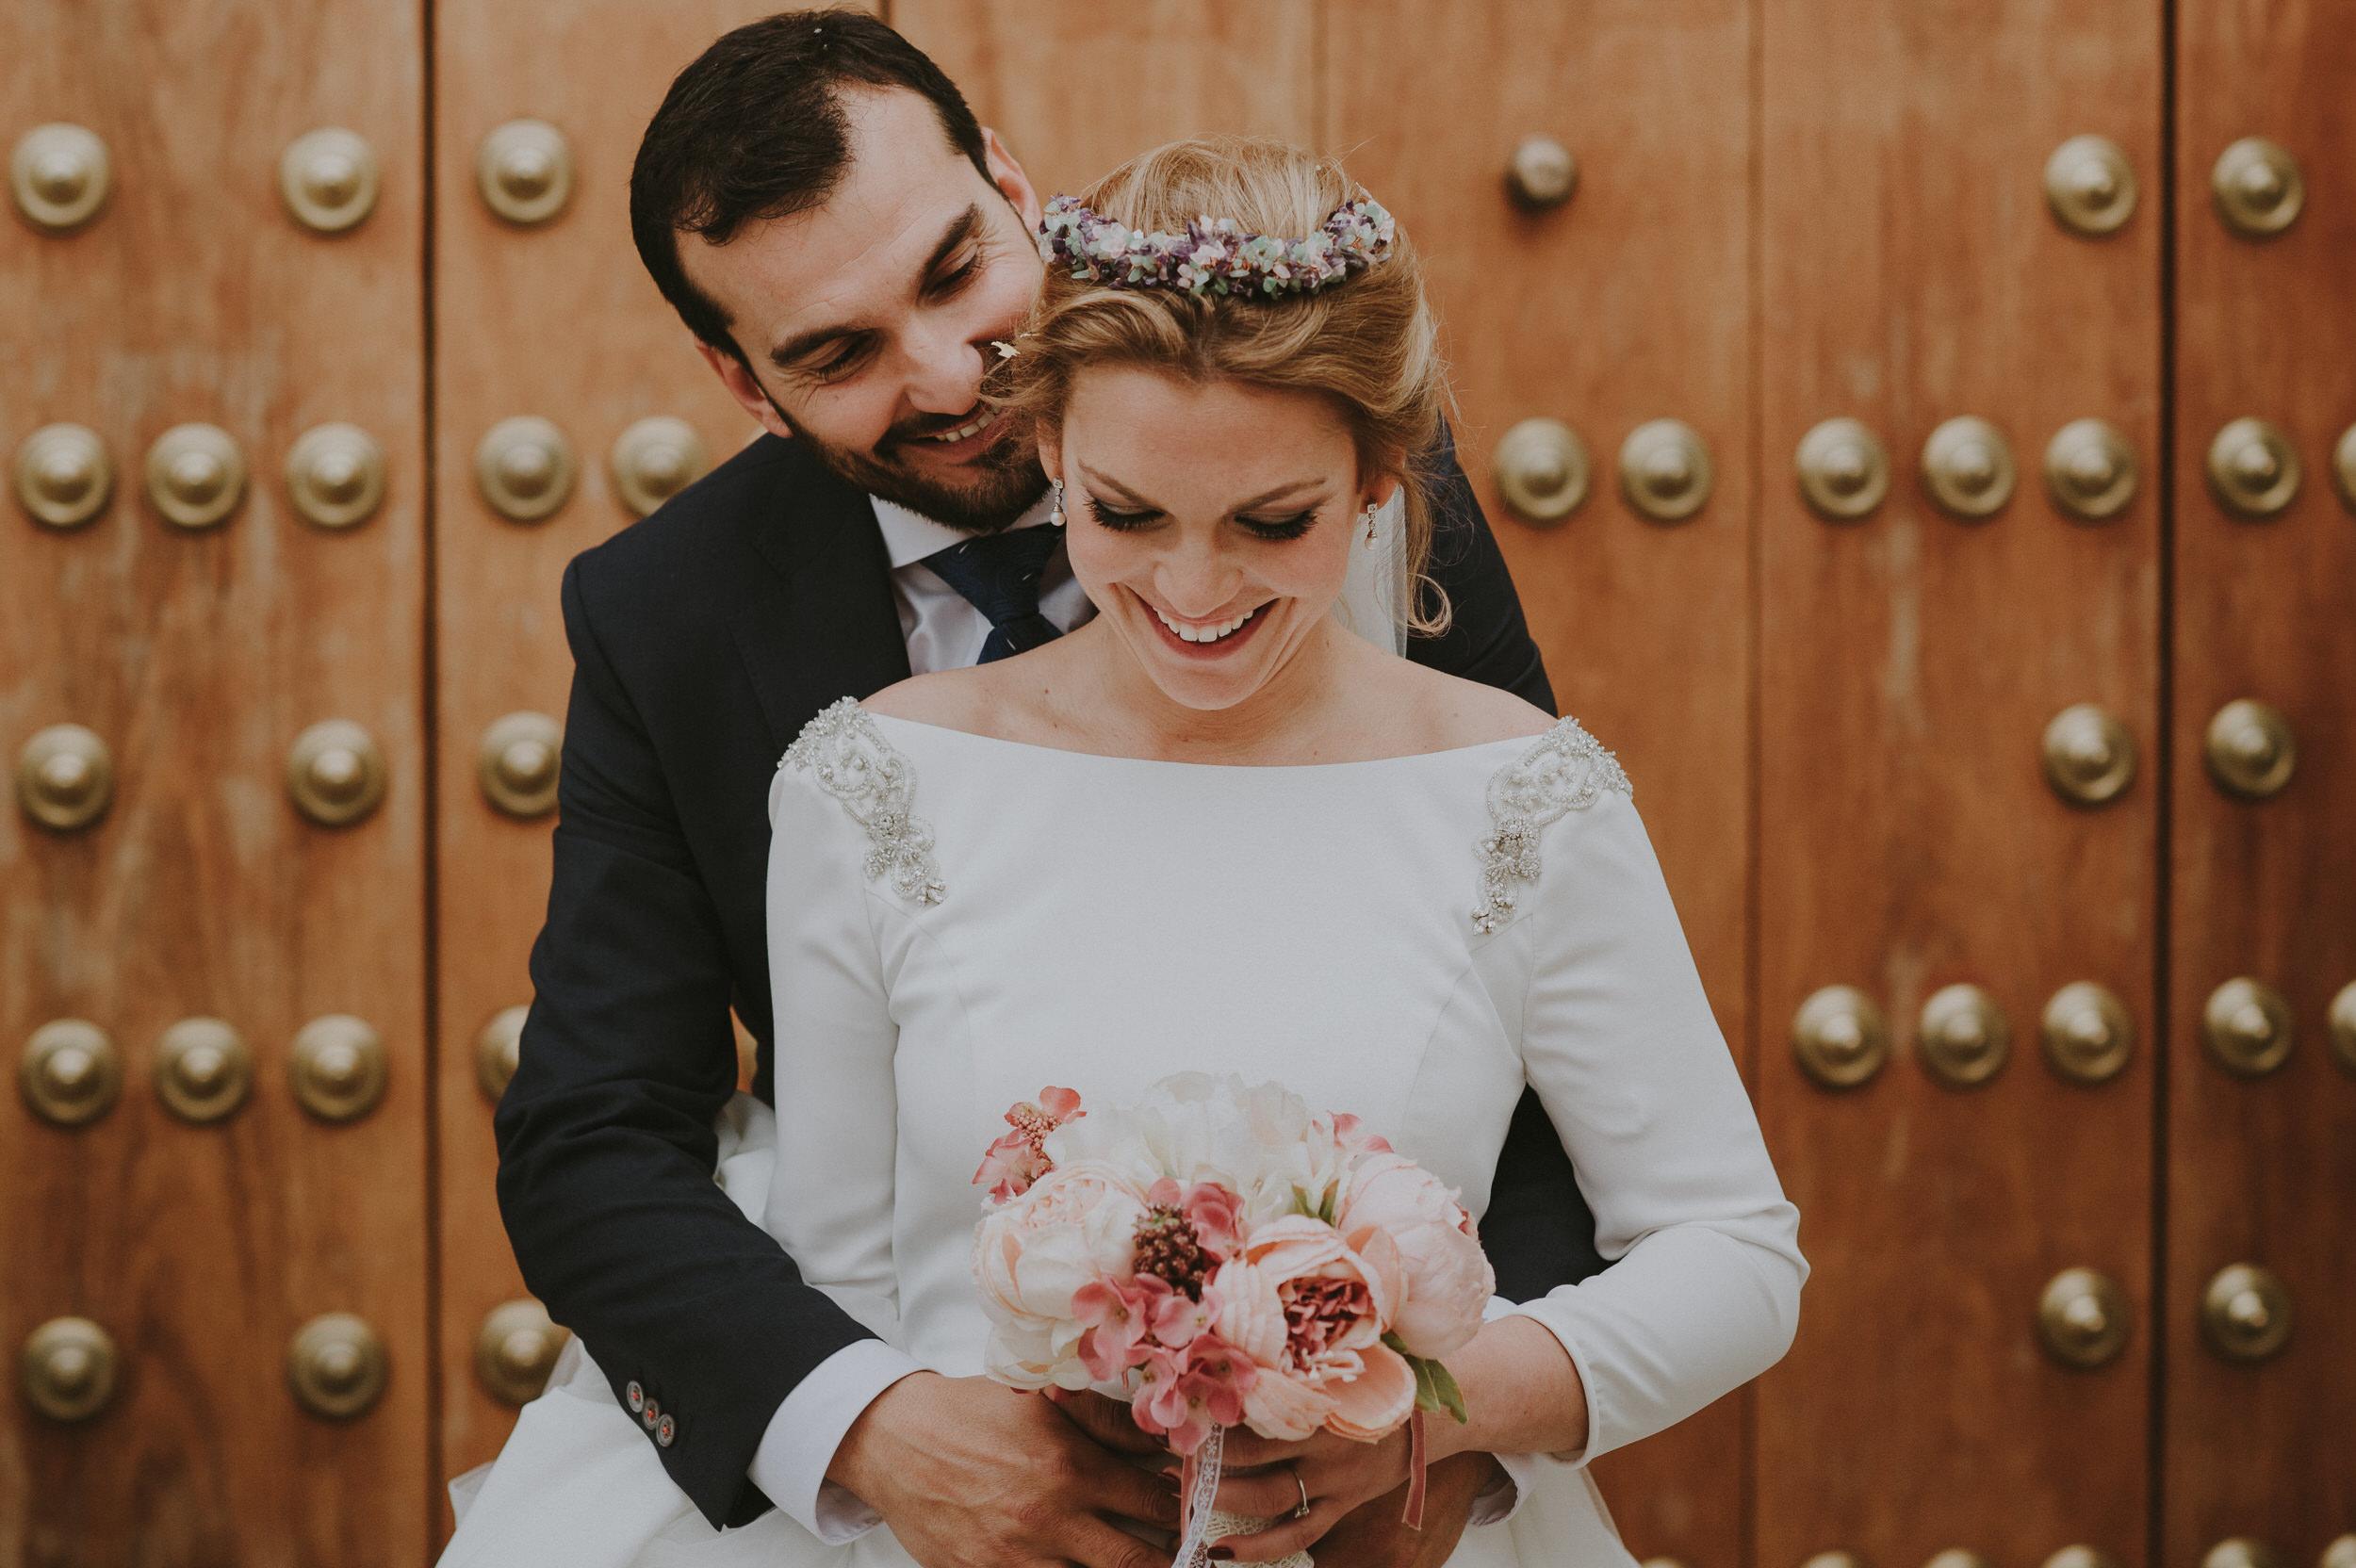 Cristina & Jero - Boda en Ecija - Iglesia Santa Ana - Fotógrafo Andrés Amarillo (45).JPG